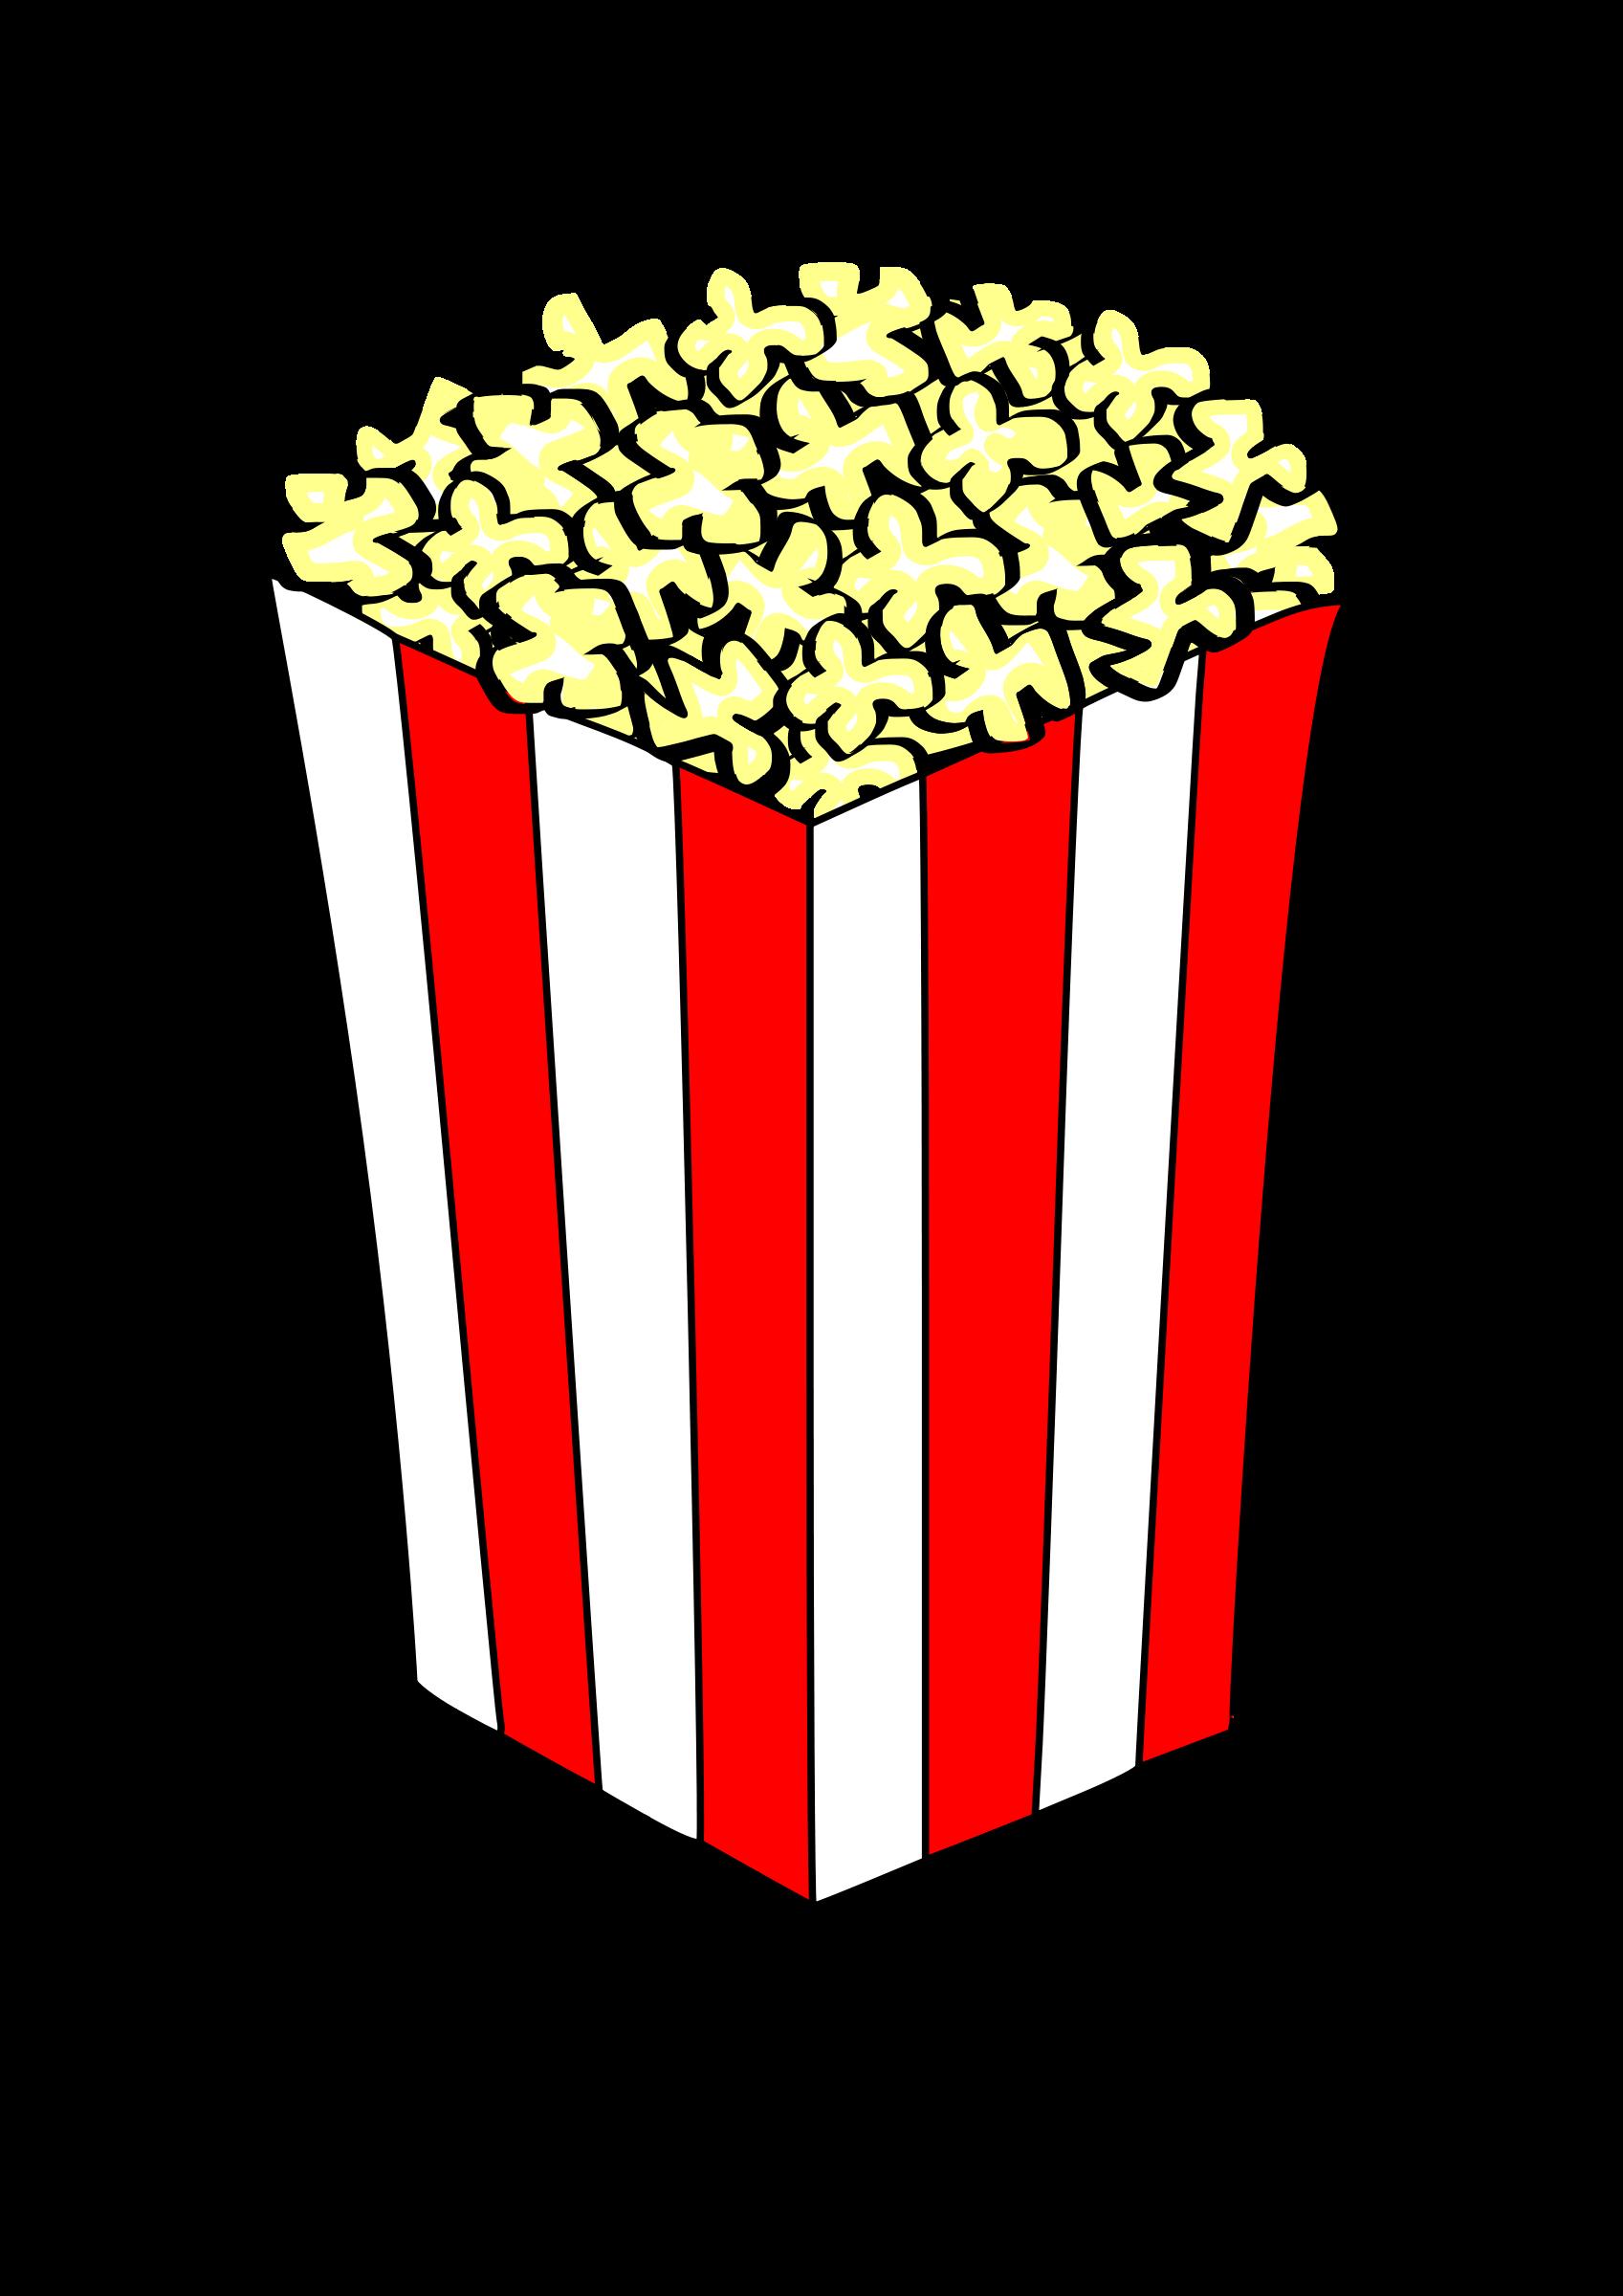 clipart popcorn clipart panda free clipart images rh clipartpanda com popcorn clip art free popcorn clip art border